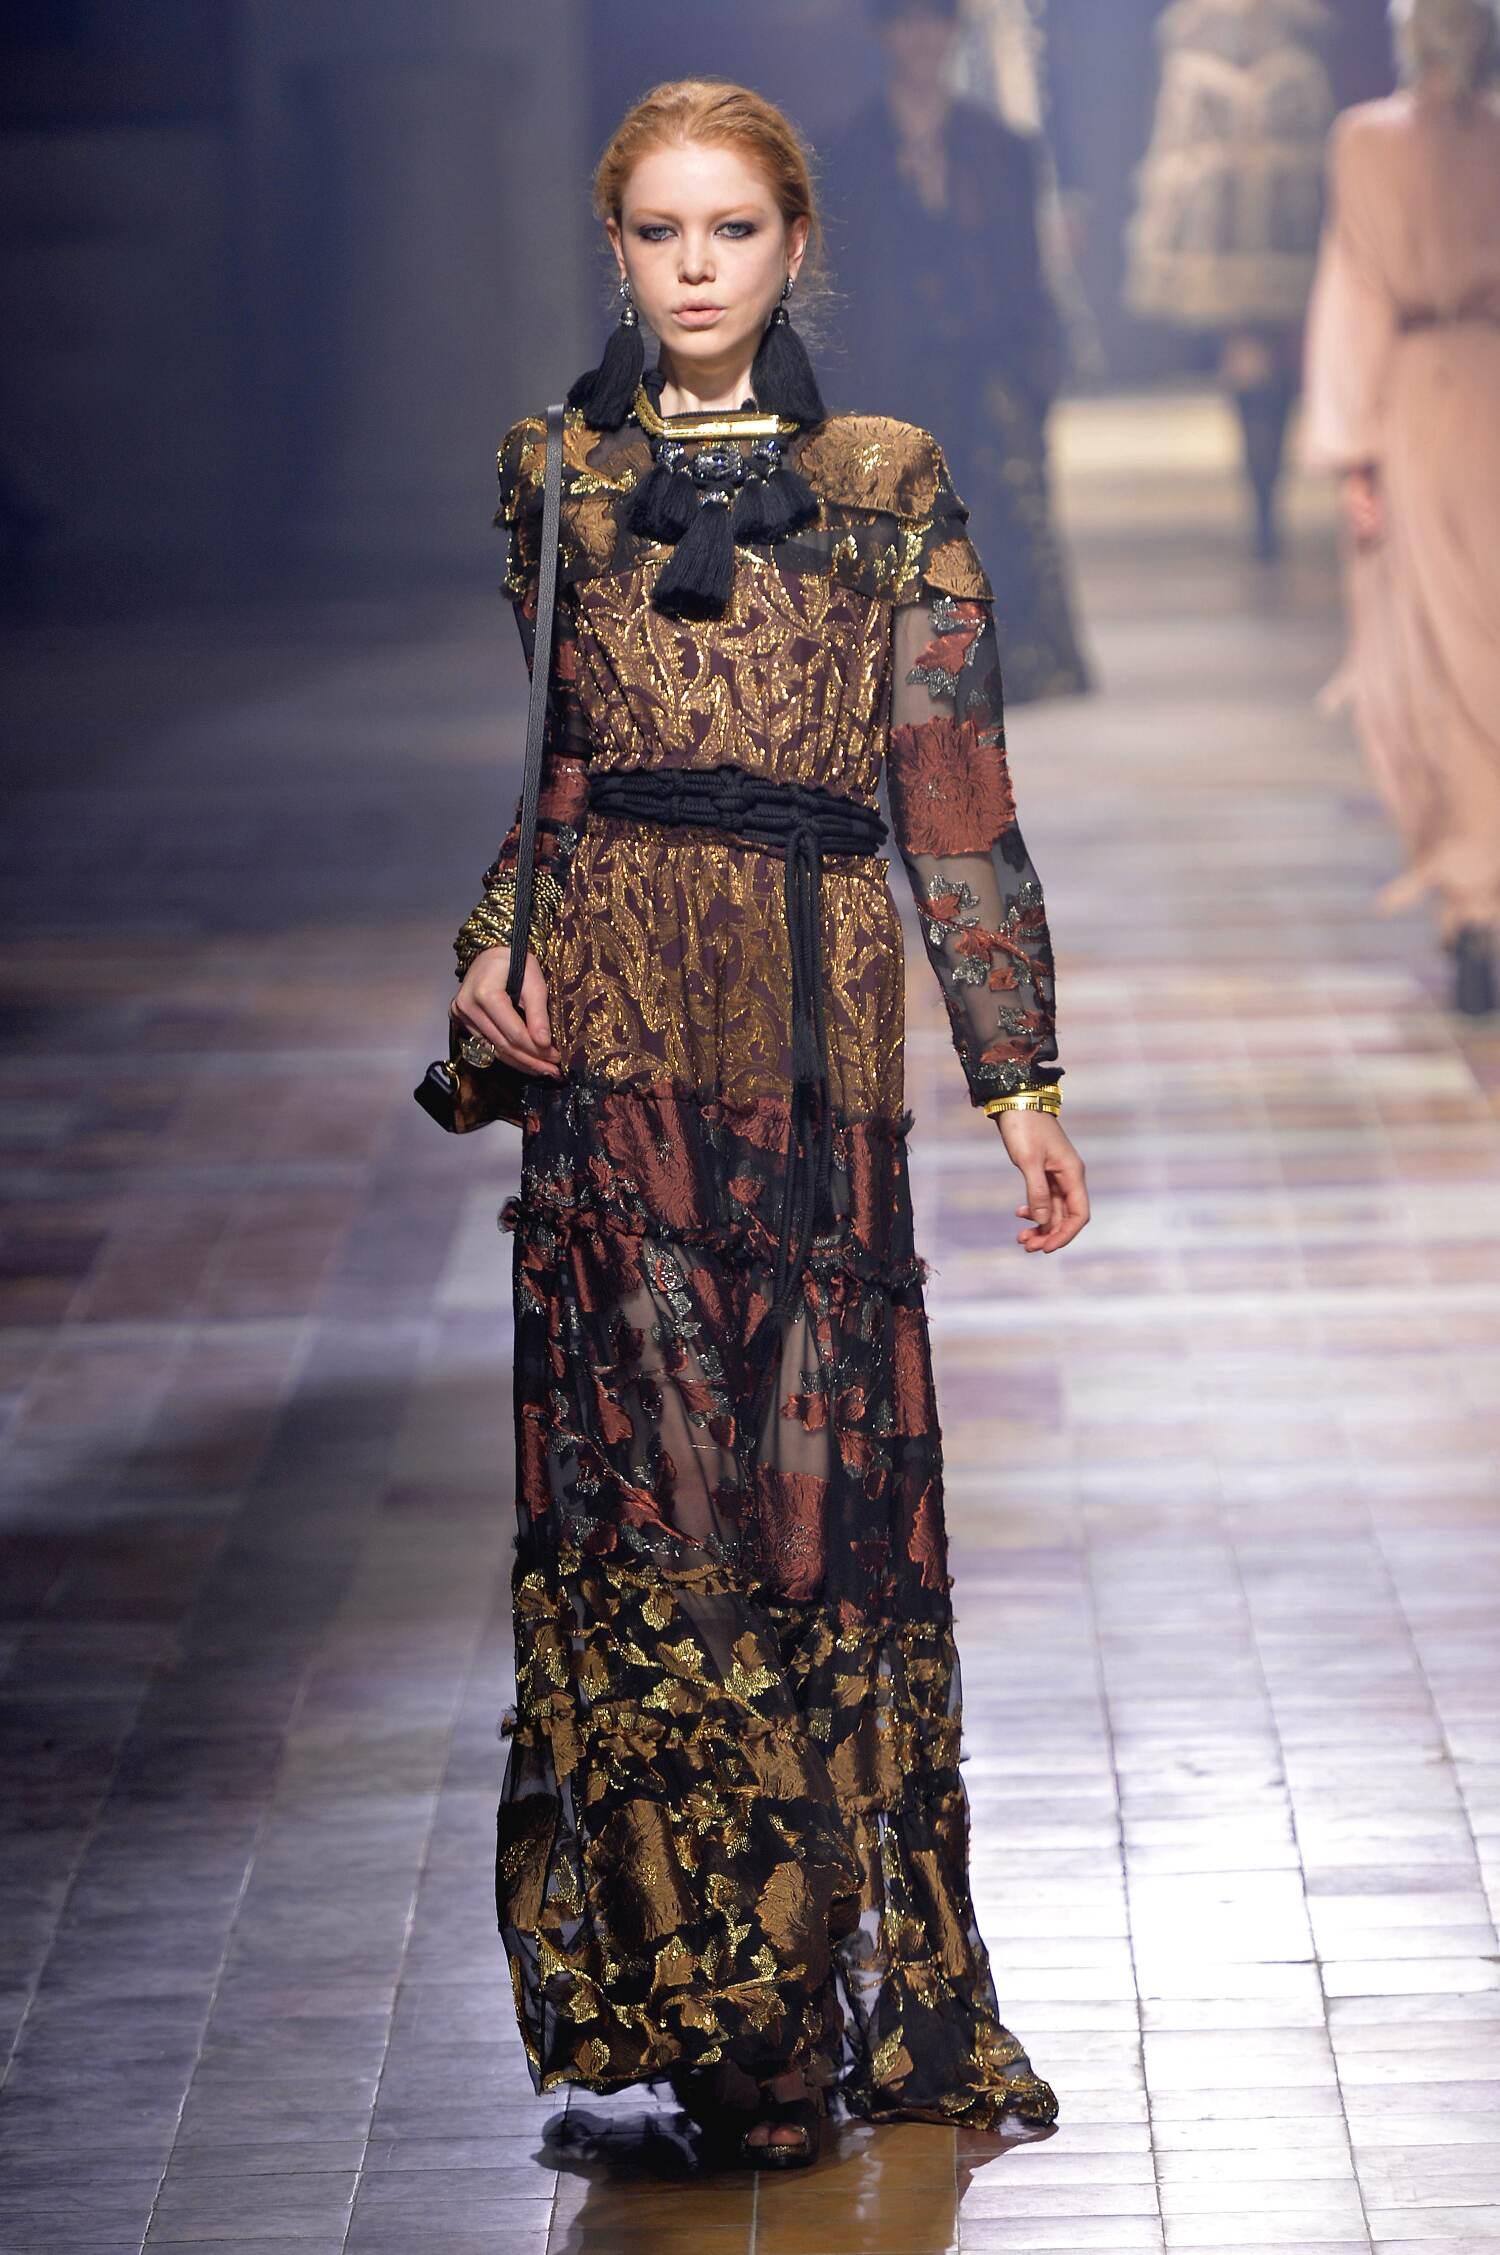 Catwalk Lanvin Collection Fashion Show Winter 2015